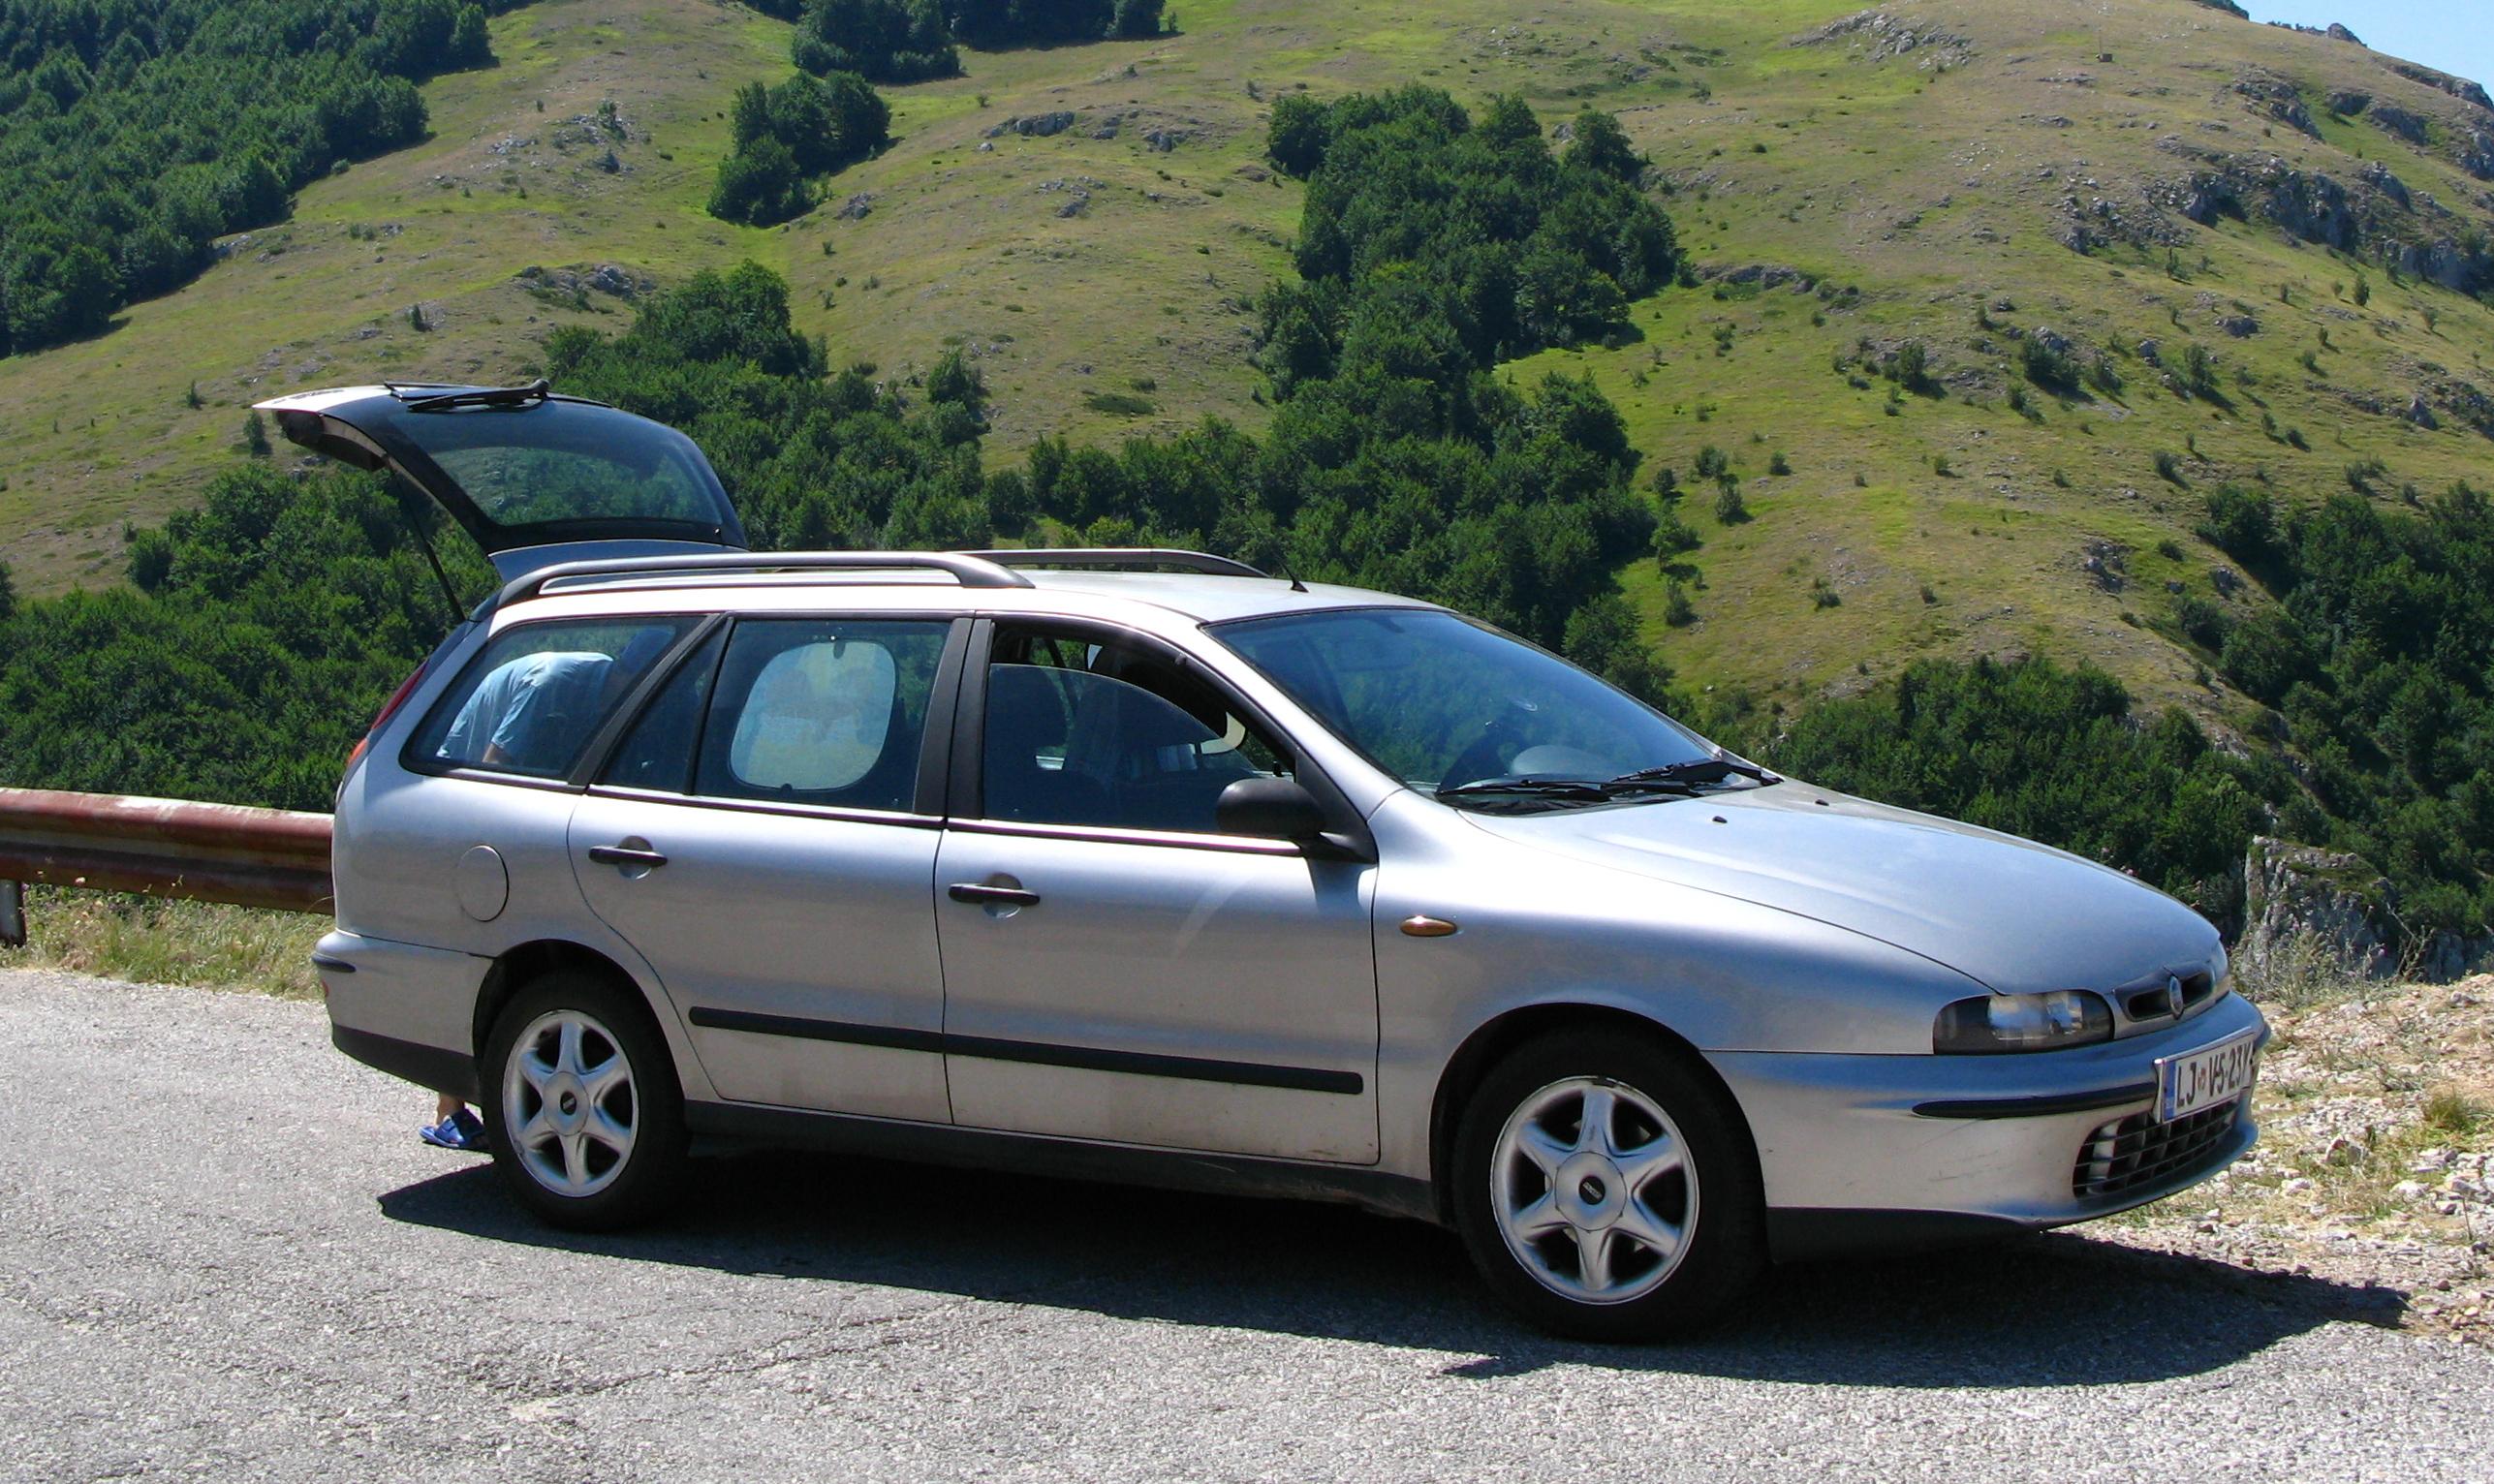 File:Fiat Marea JTD.JPG - Wikimedia Commons